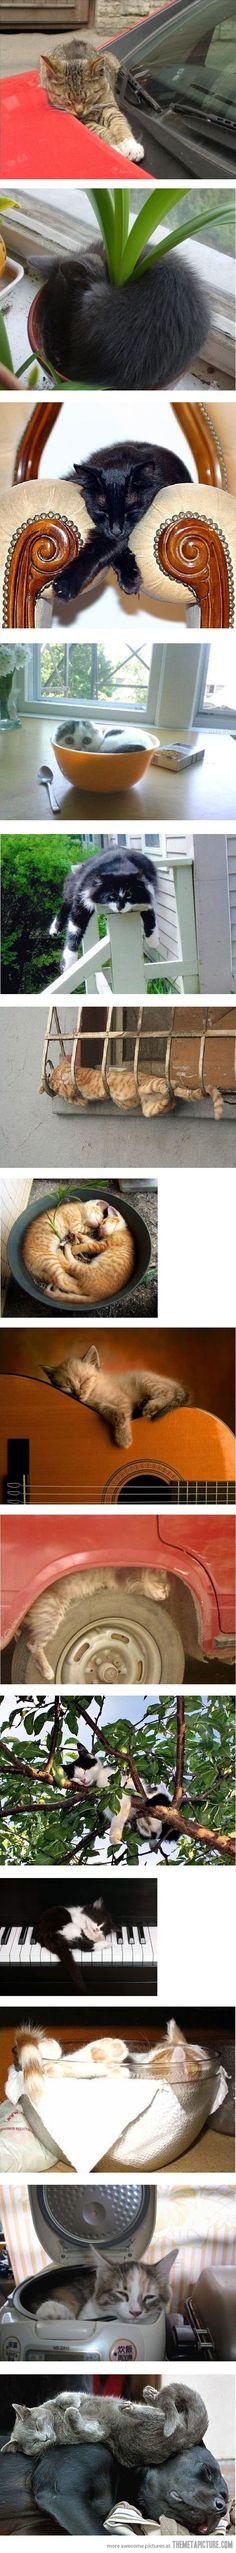 silly little kitty!